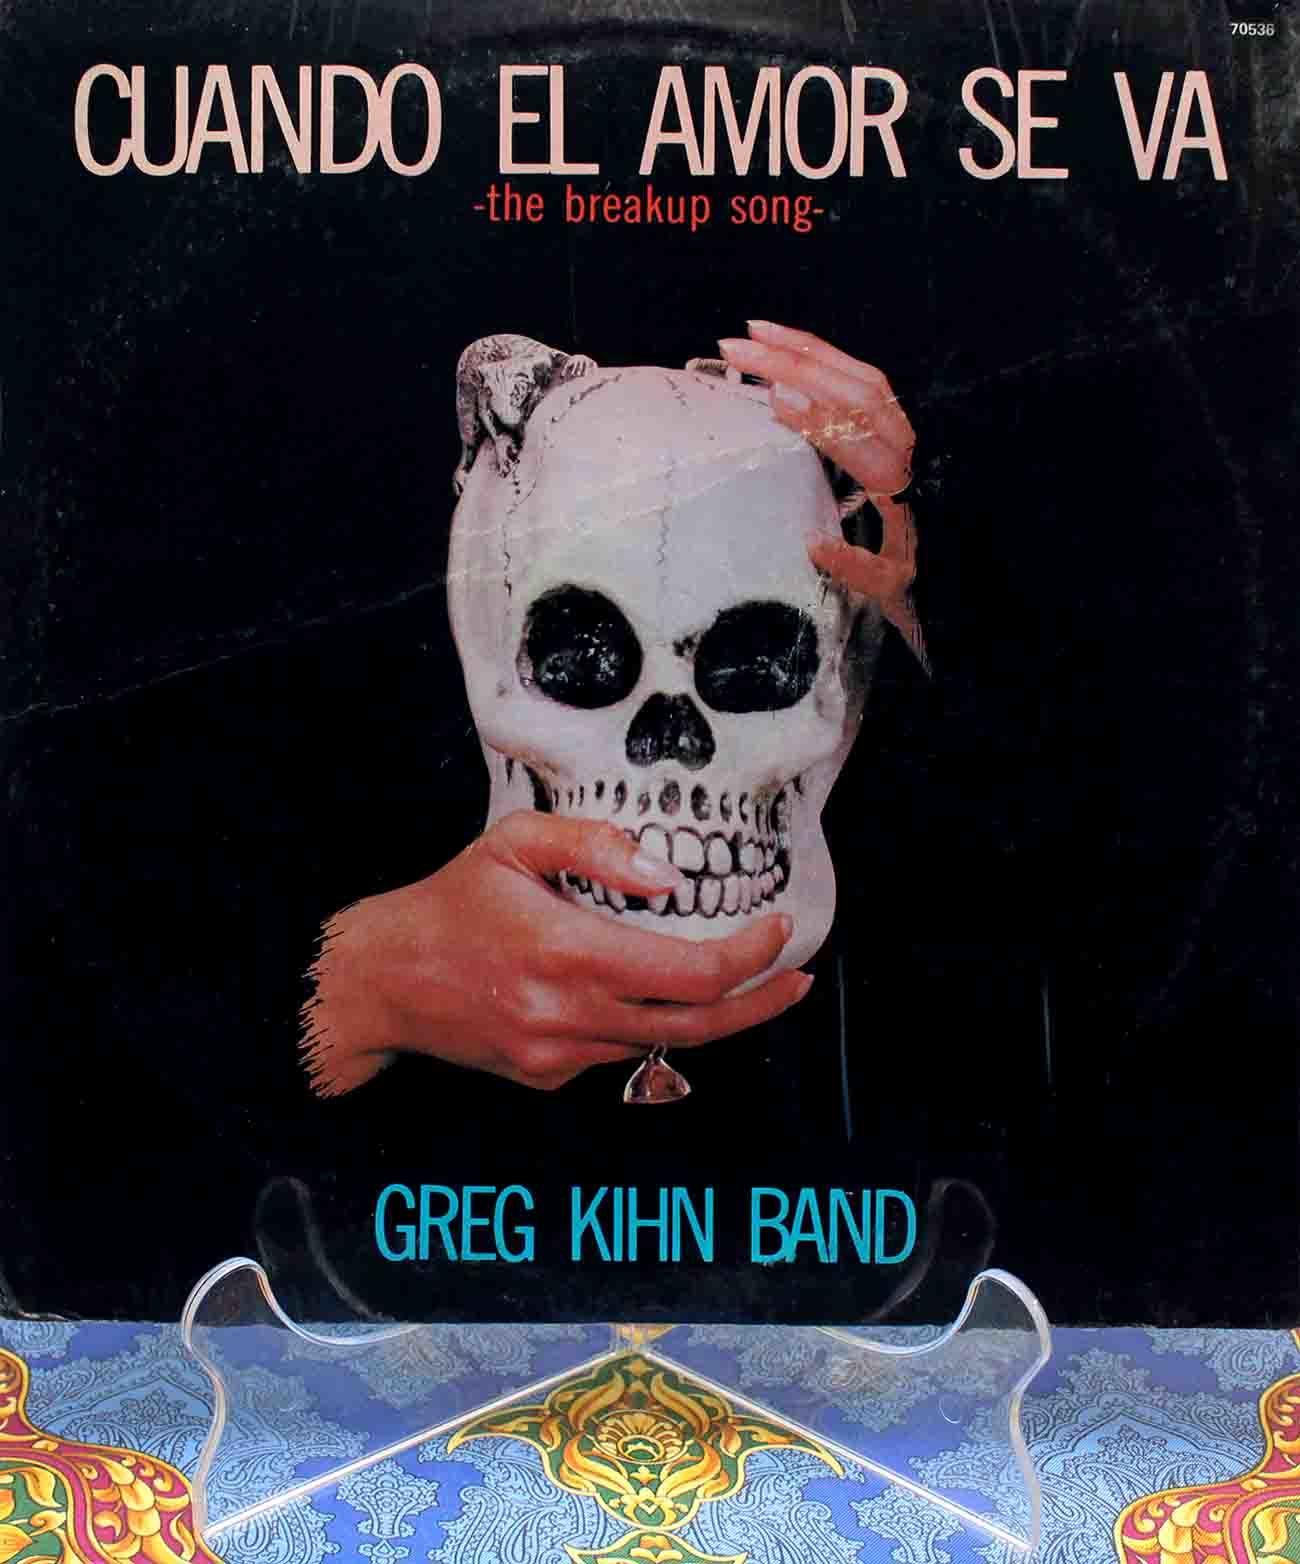 Greg Kihn Band – The Breakup Song 01